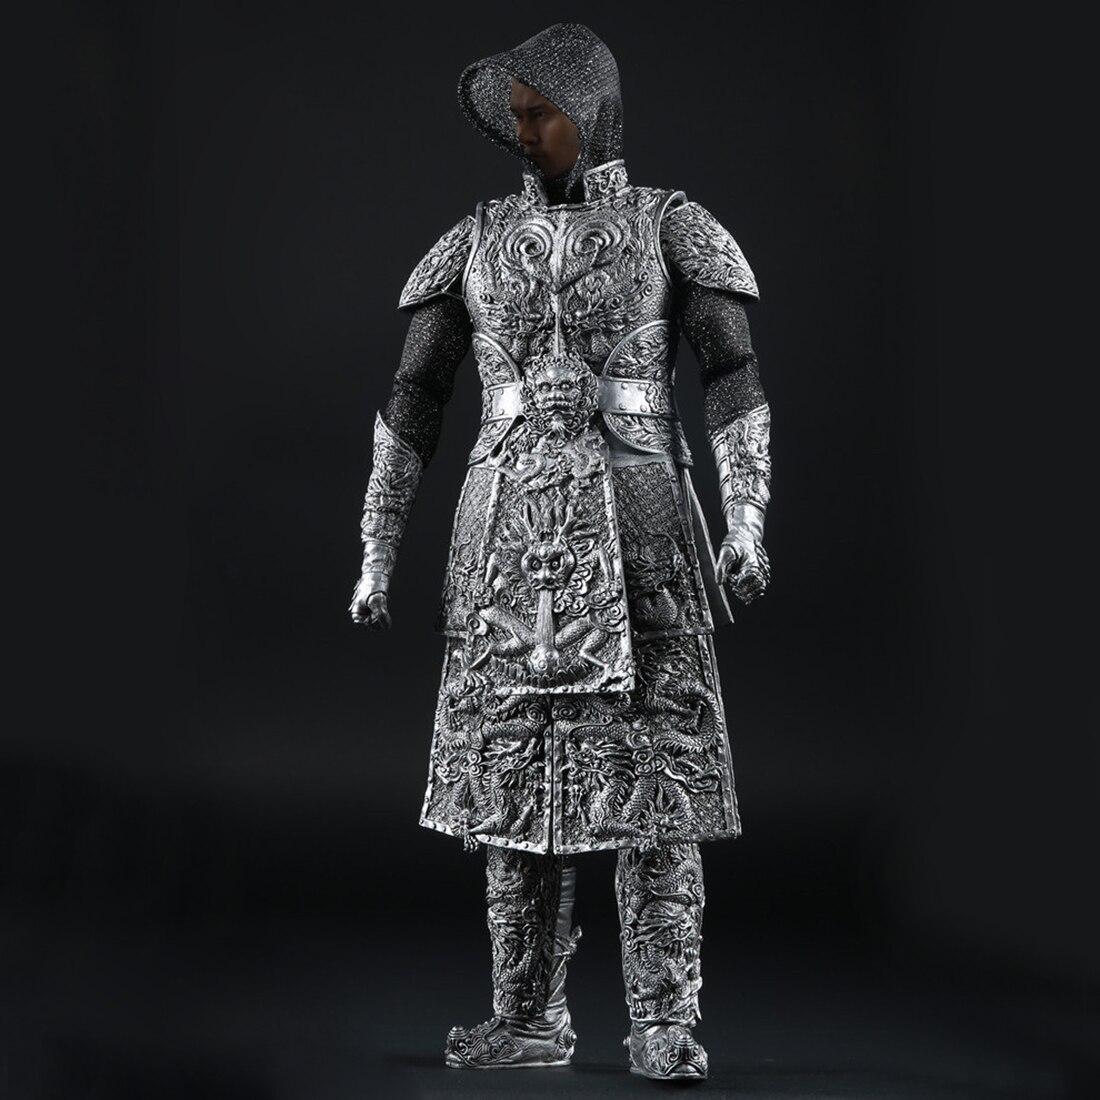 1:6 древний дракон шаблон Armour Barde одежда для 12 Мужской солдат Модель Фигурки Игрушка аксессуар серебро - 2